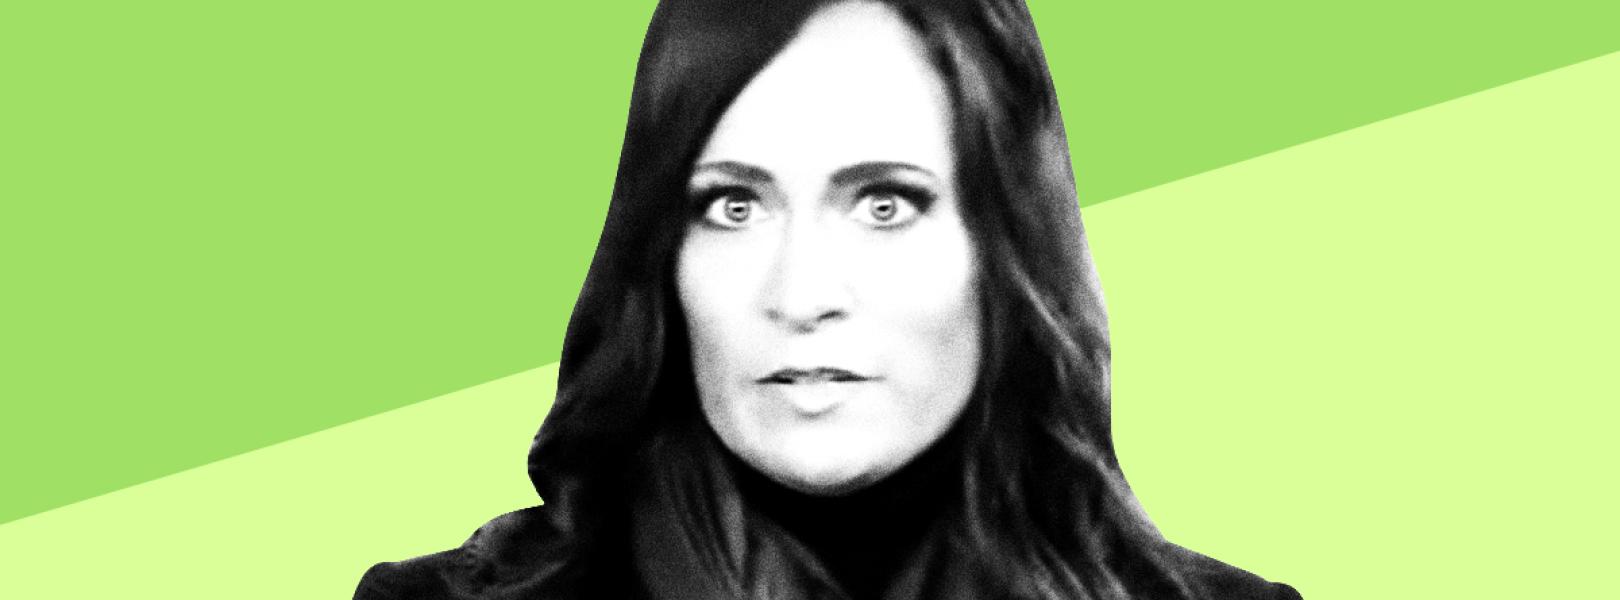 Stephanie-Grisham-Green-Background.png